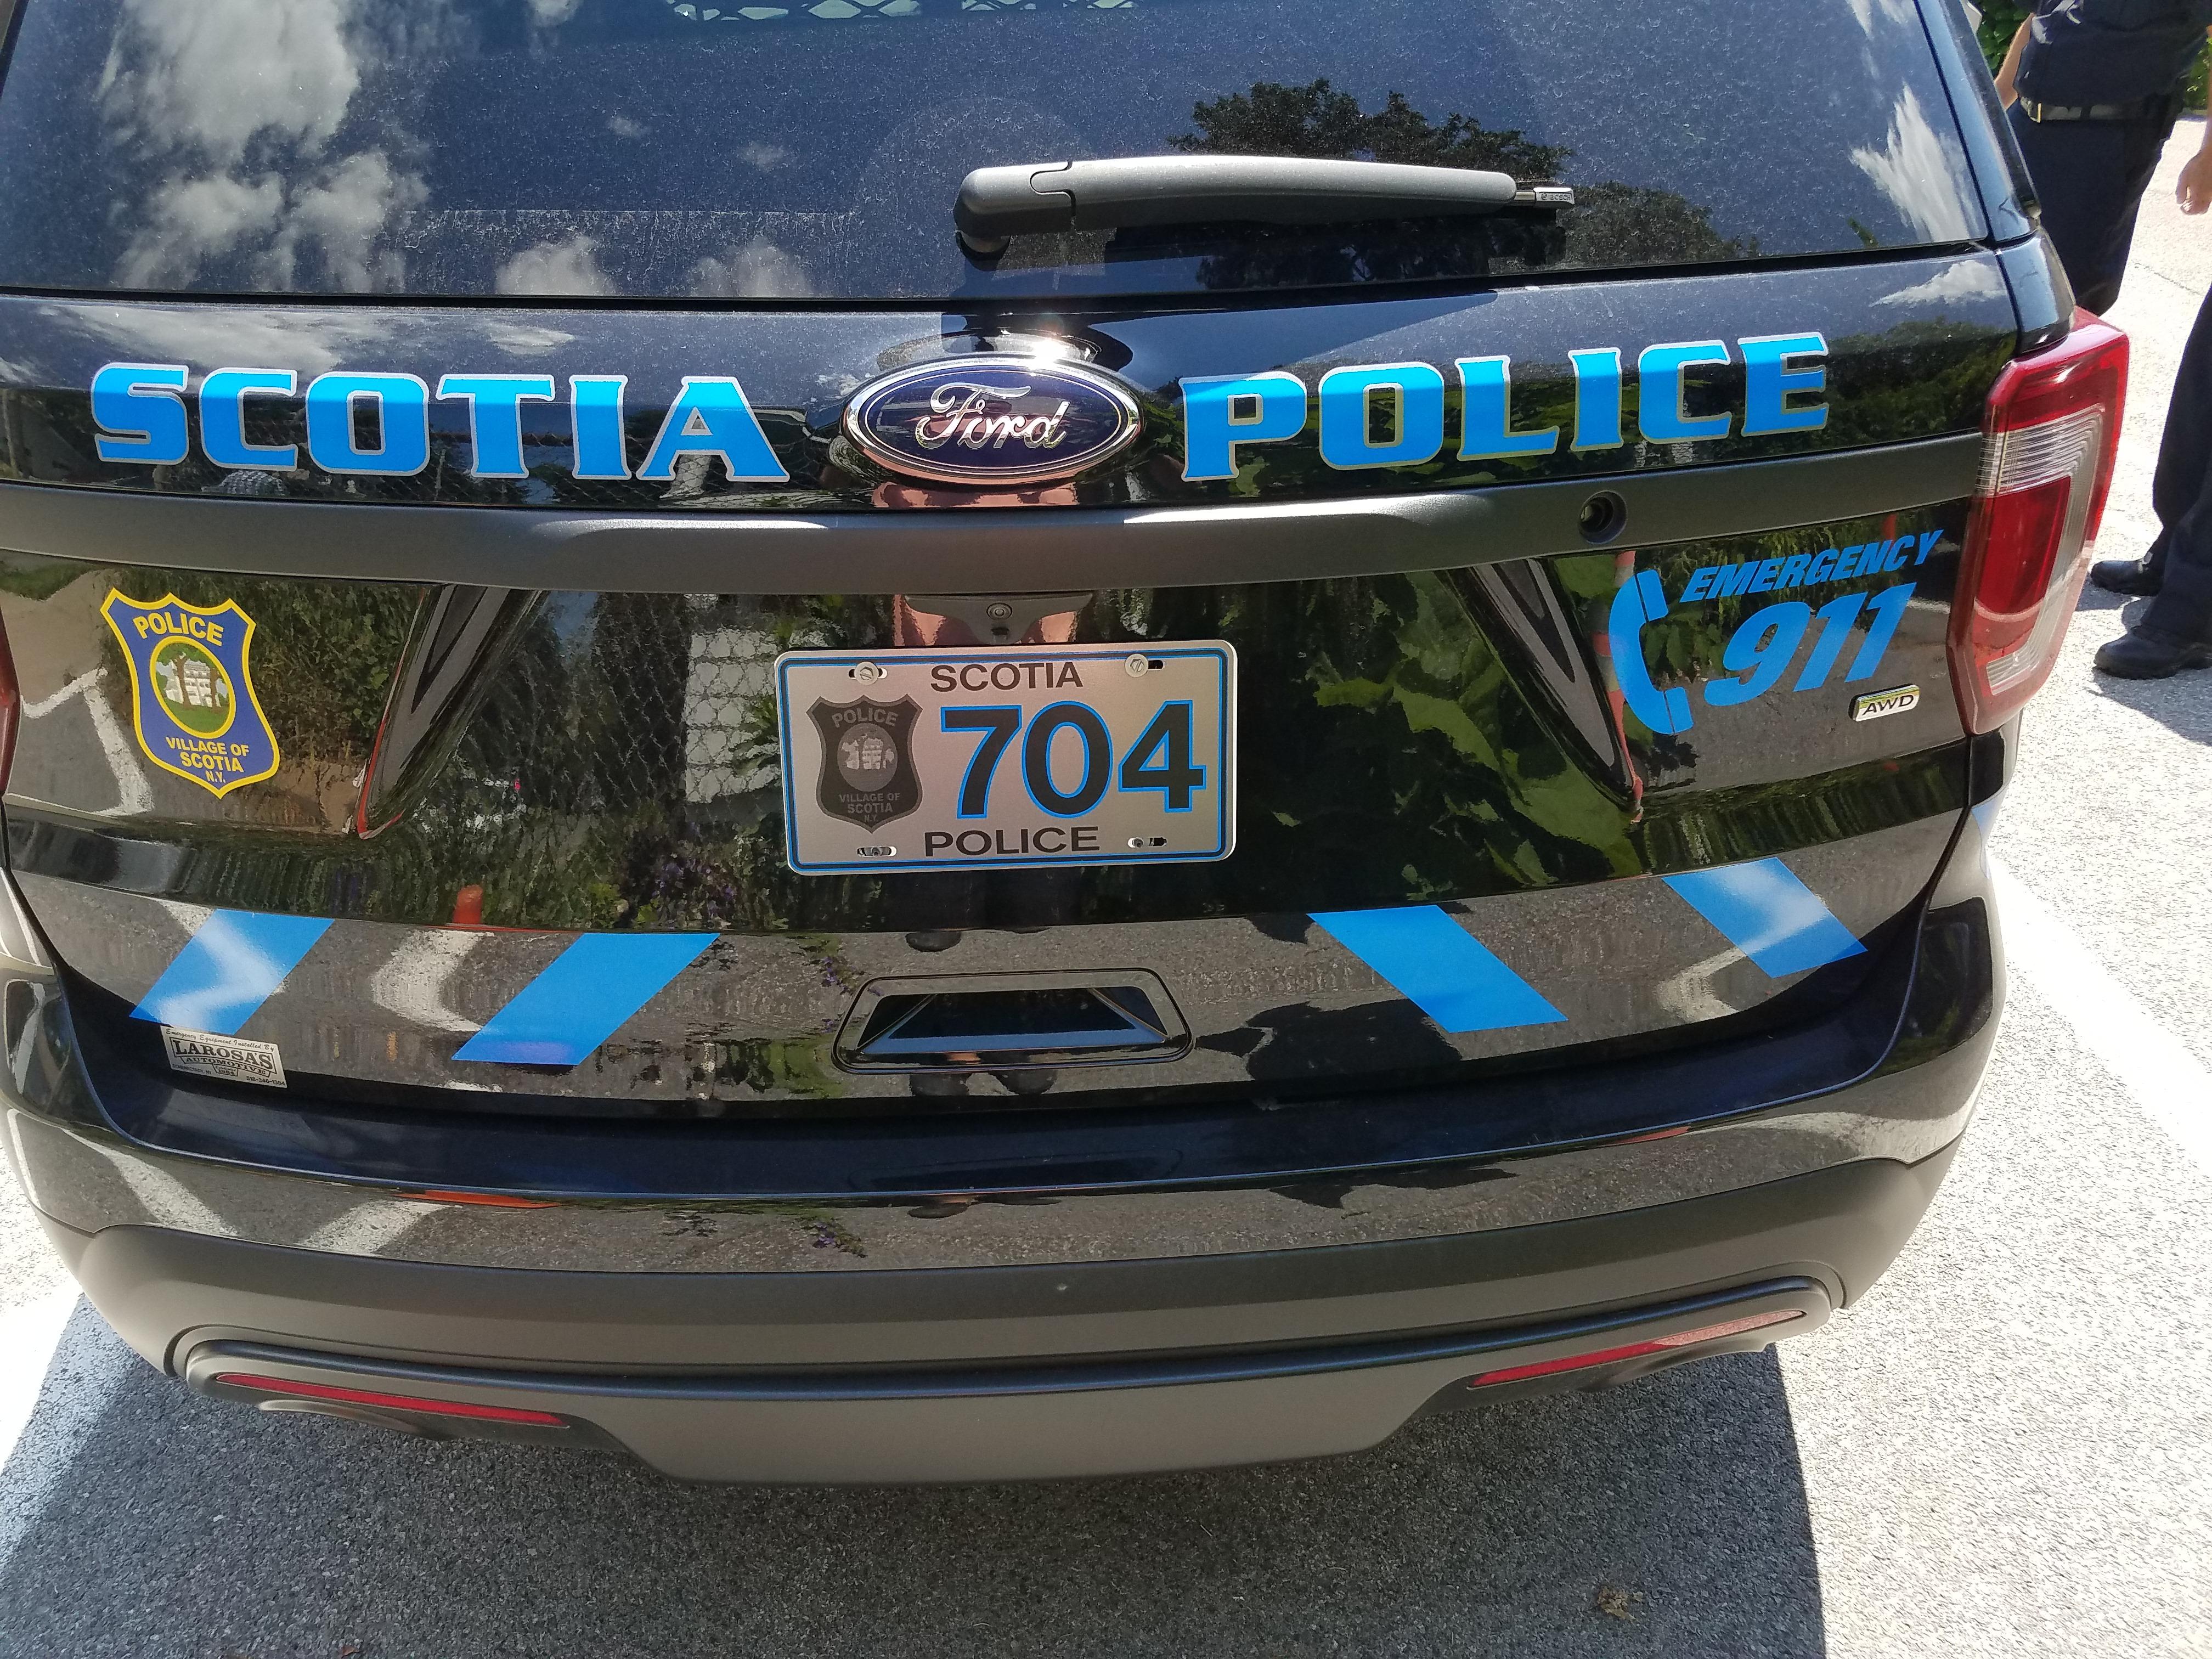 Scotia Police (4)